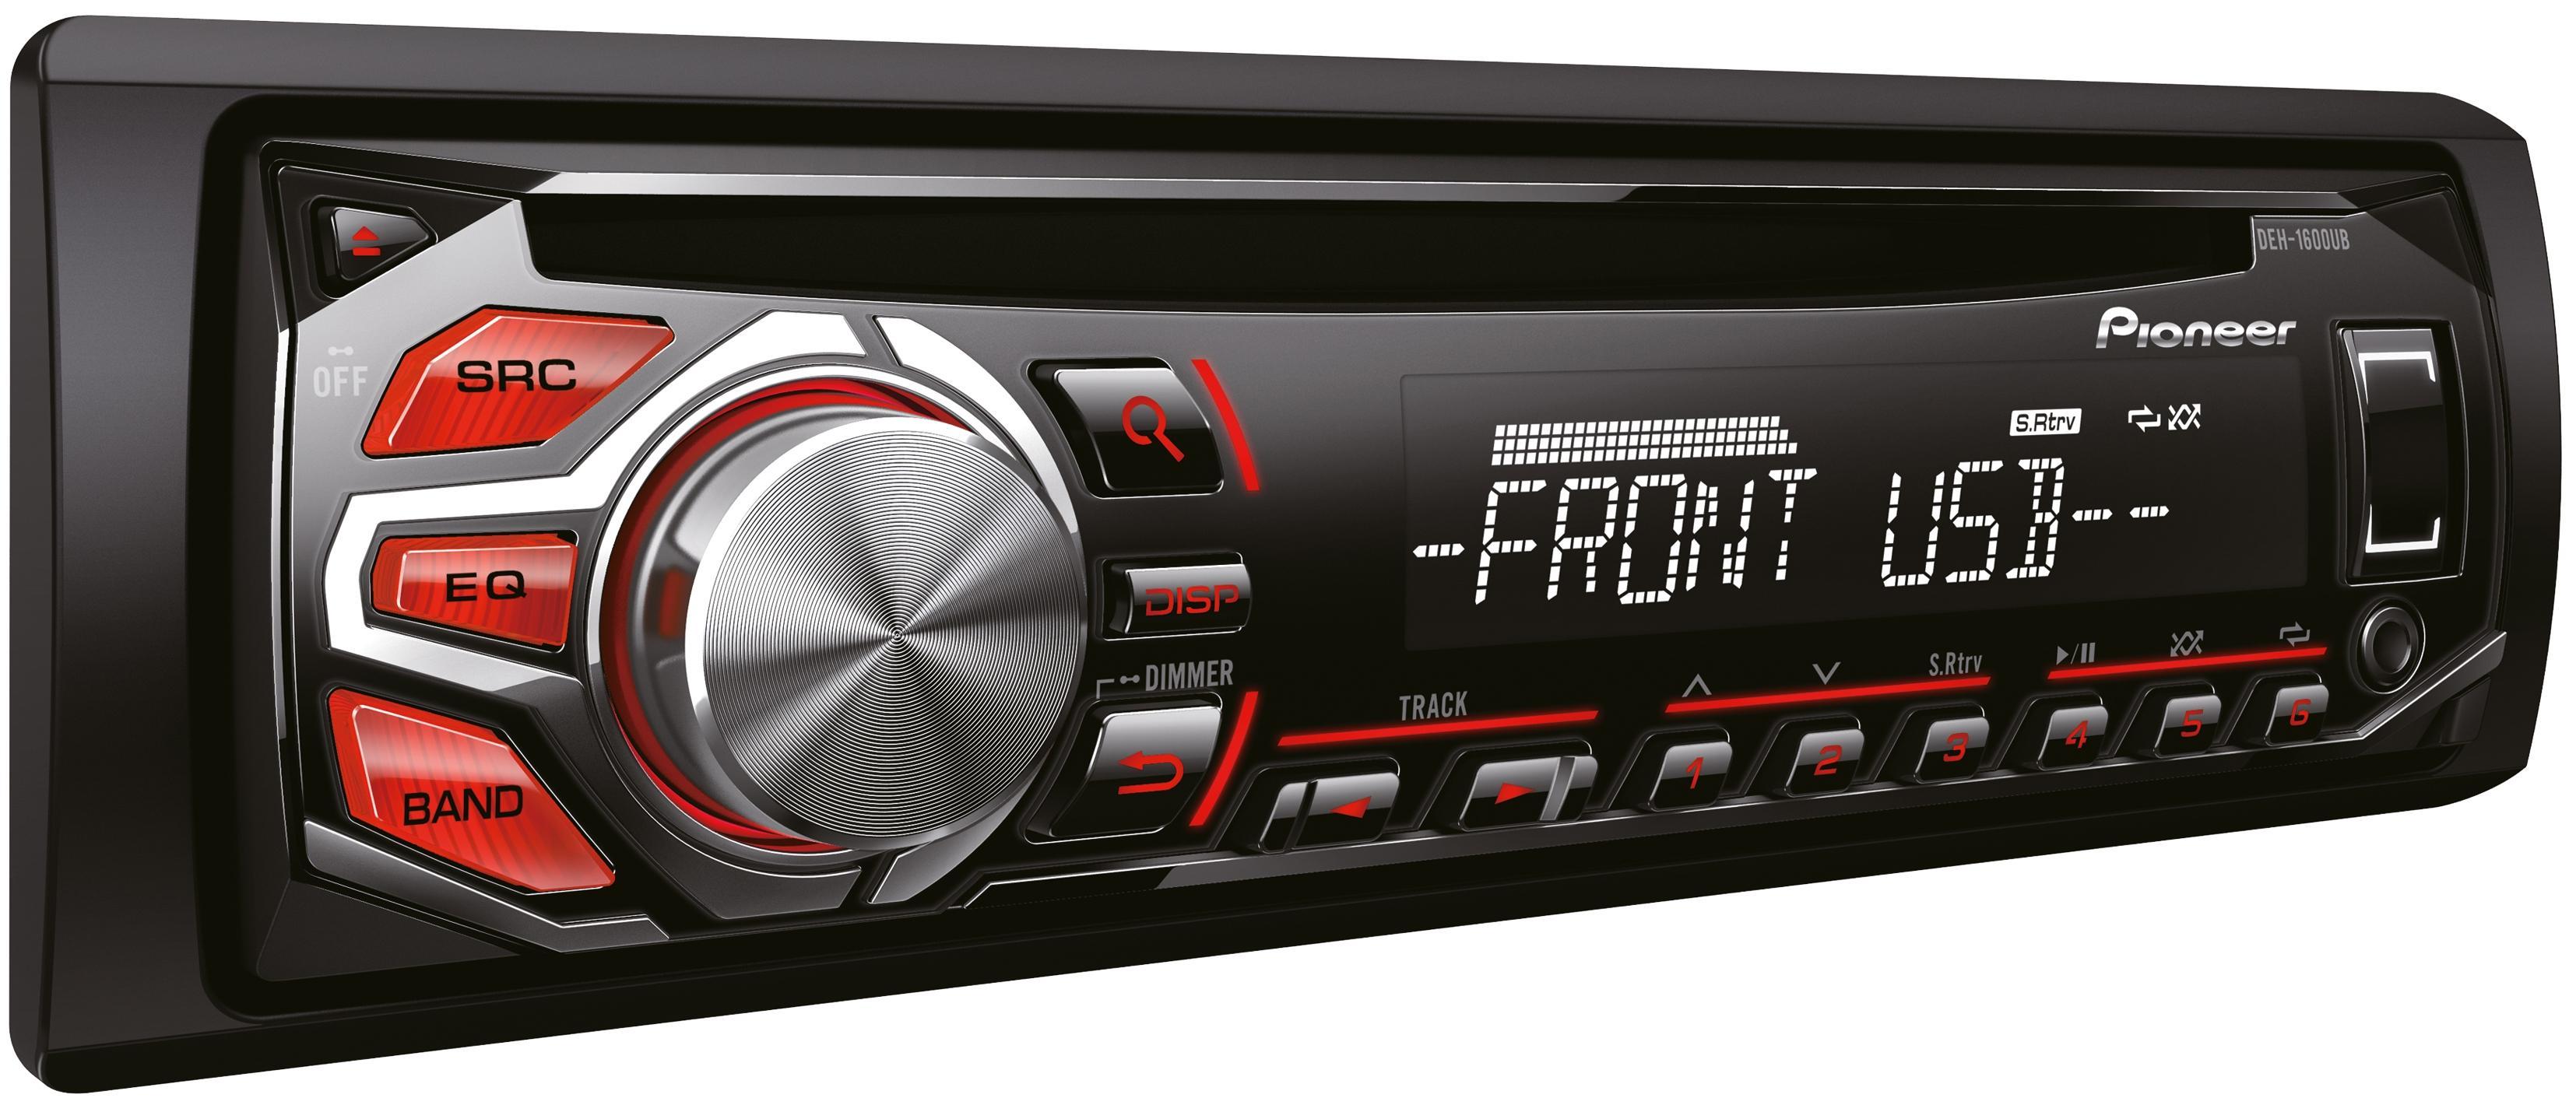 pioneer deh 1600ub car stereo head unit radio mp3 player. Black Bedroom Furniture Sets. Home Design Ideas